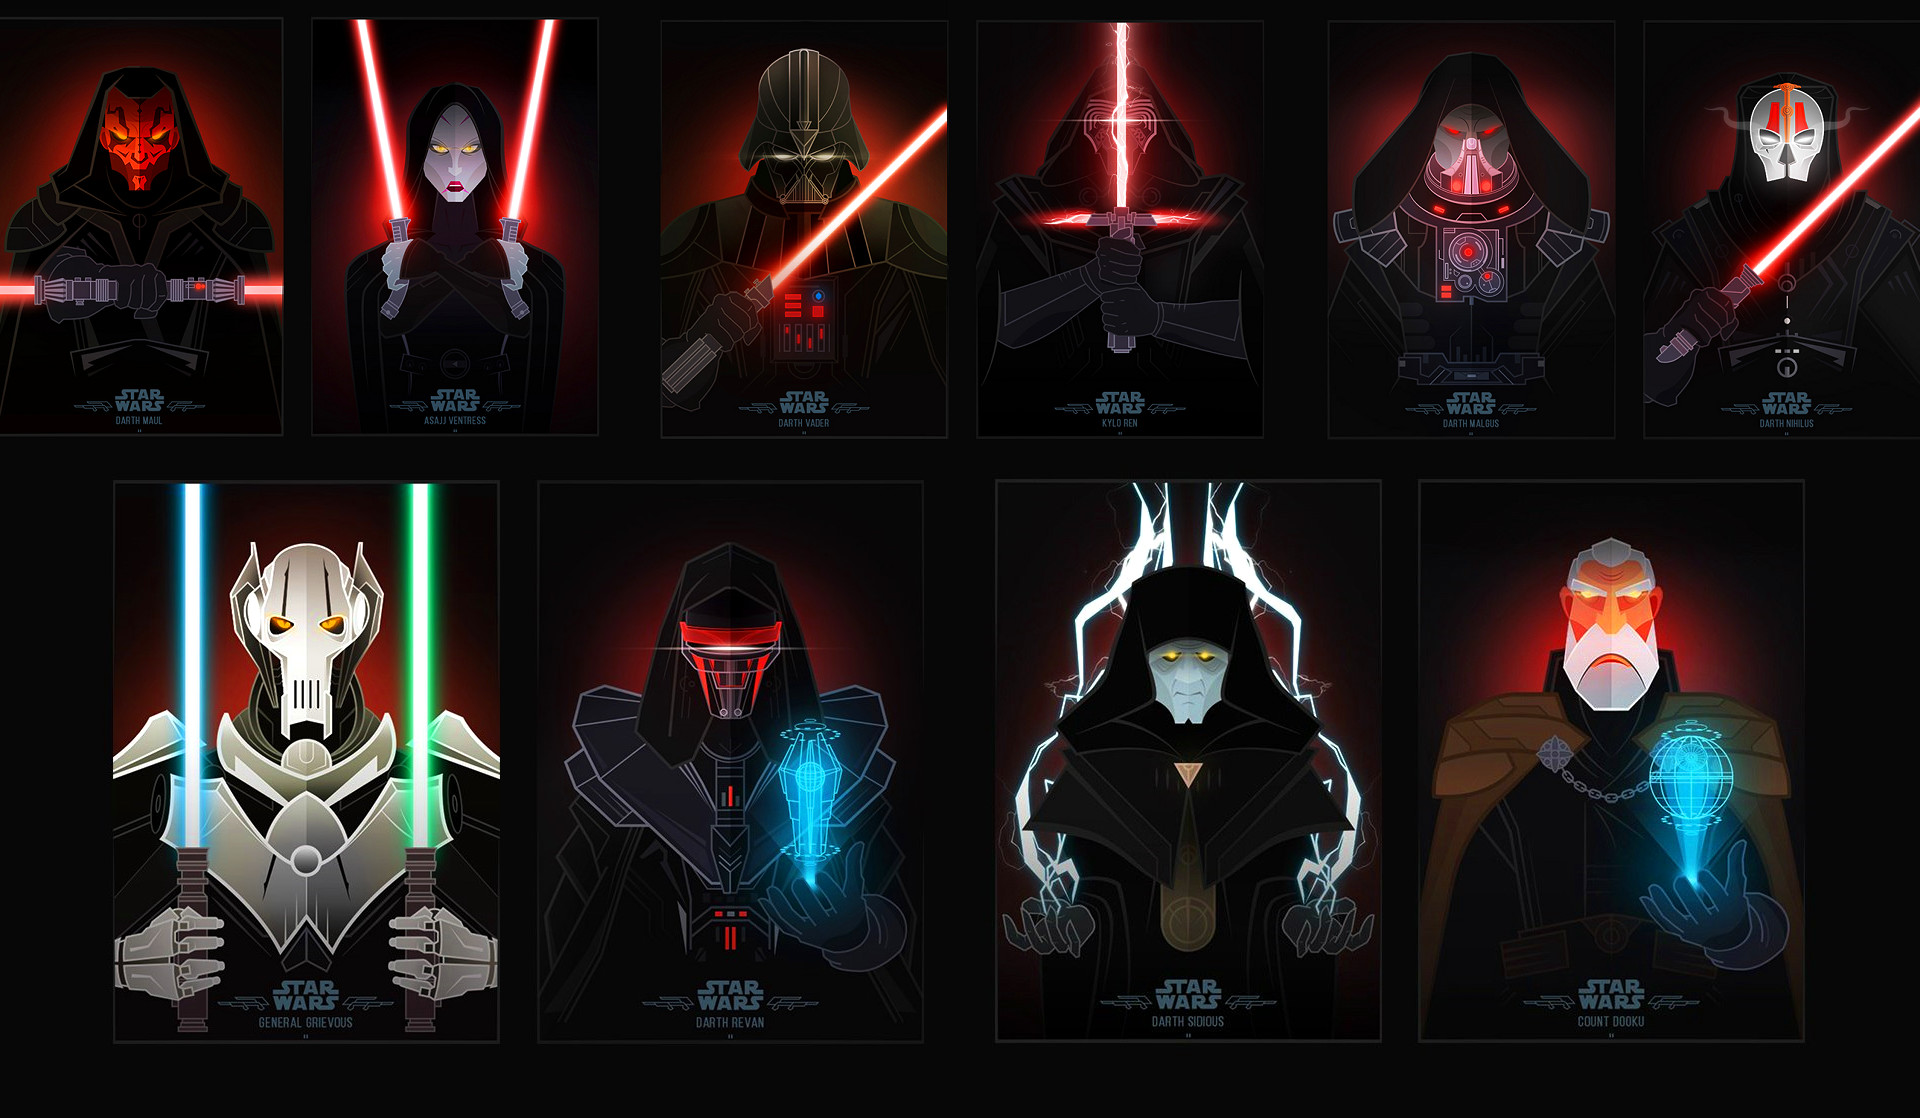 Star Wars Sith Wallpapers Hd Resolution As Wallpaper HD